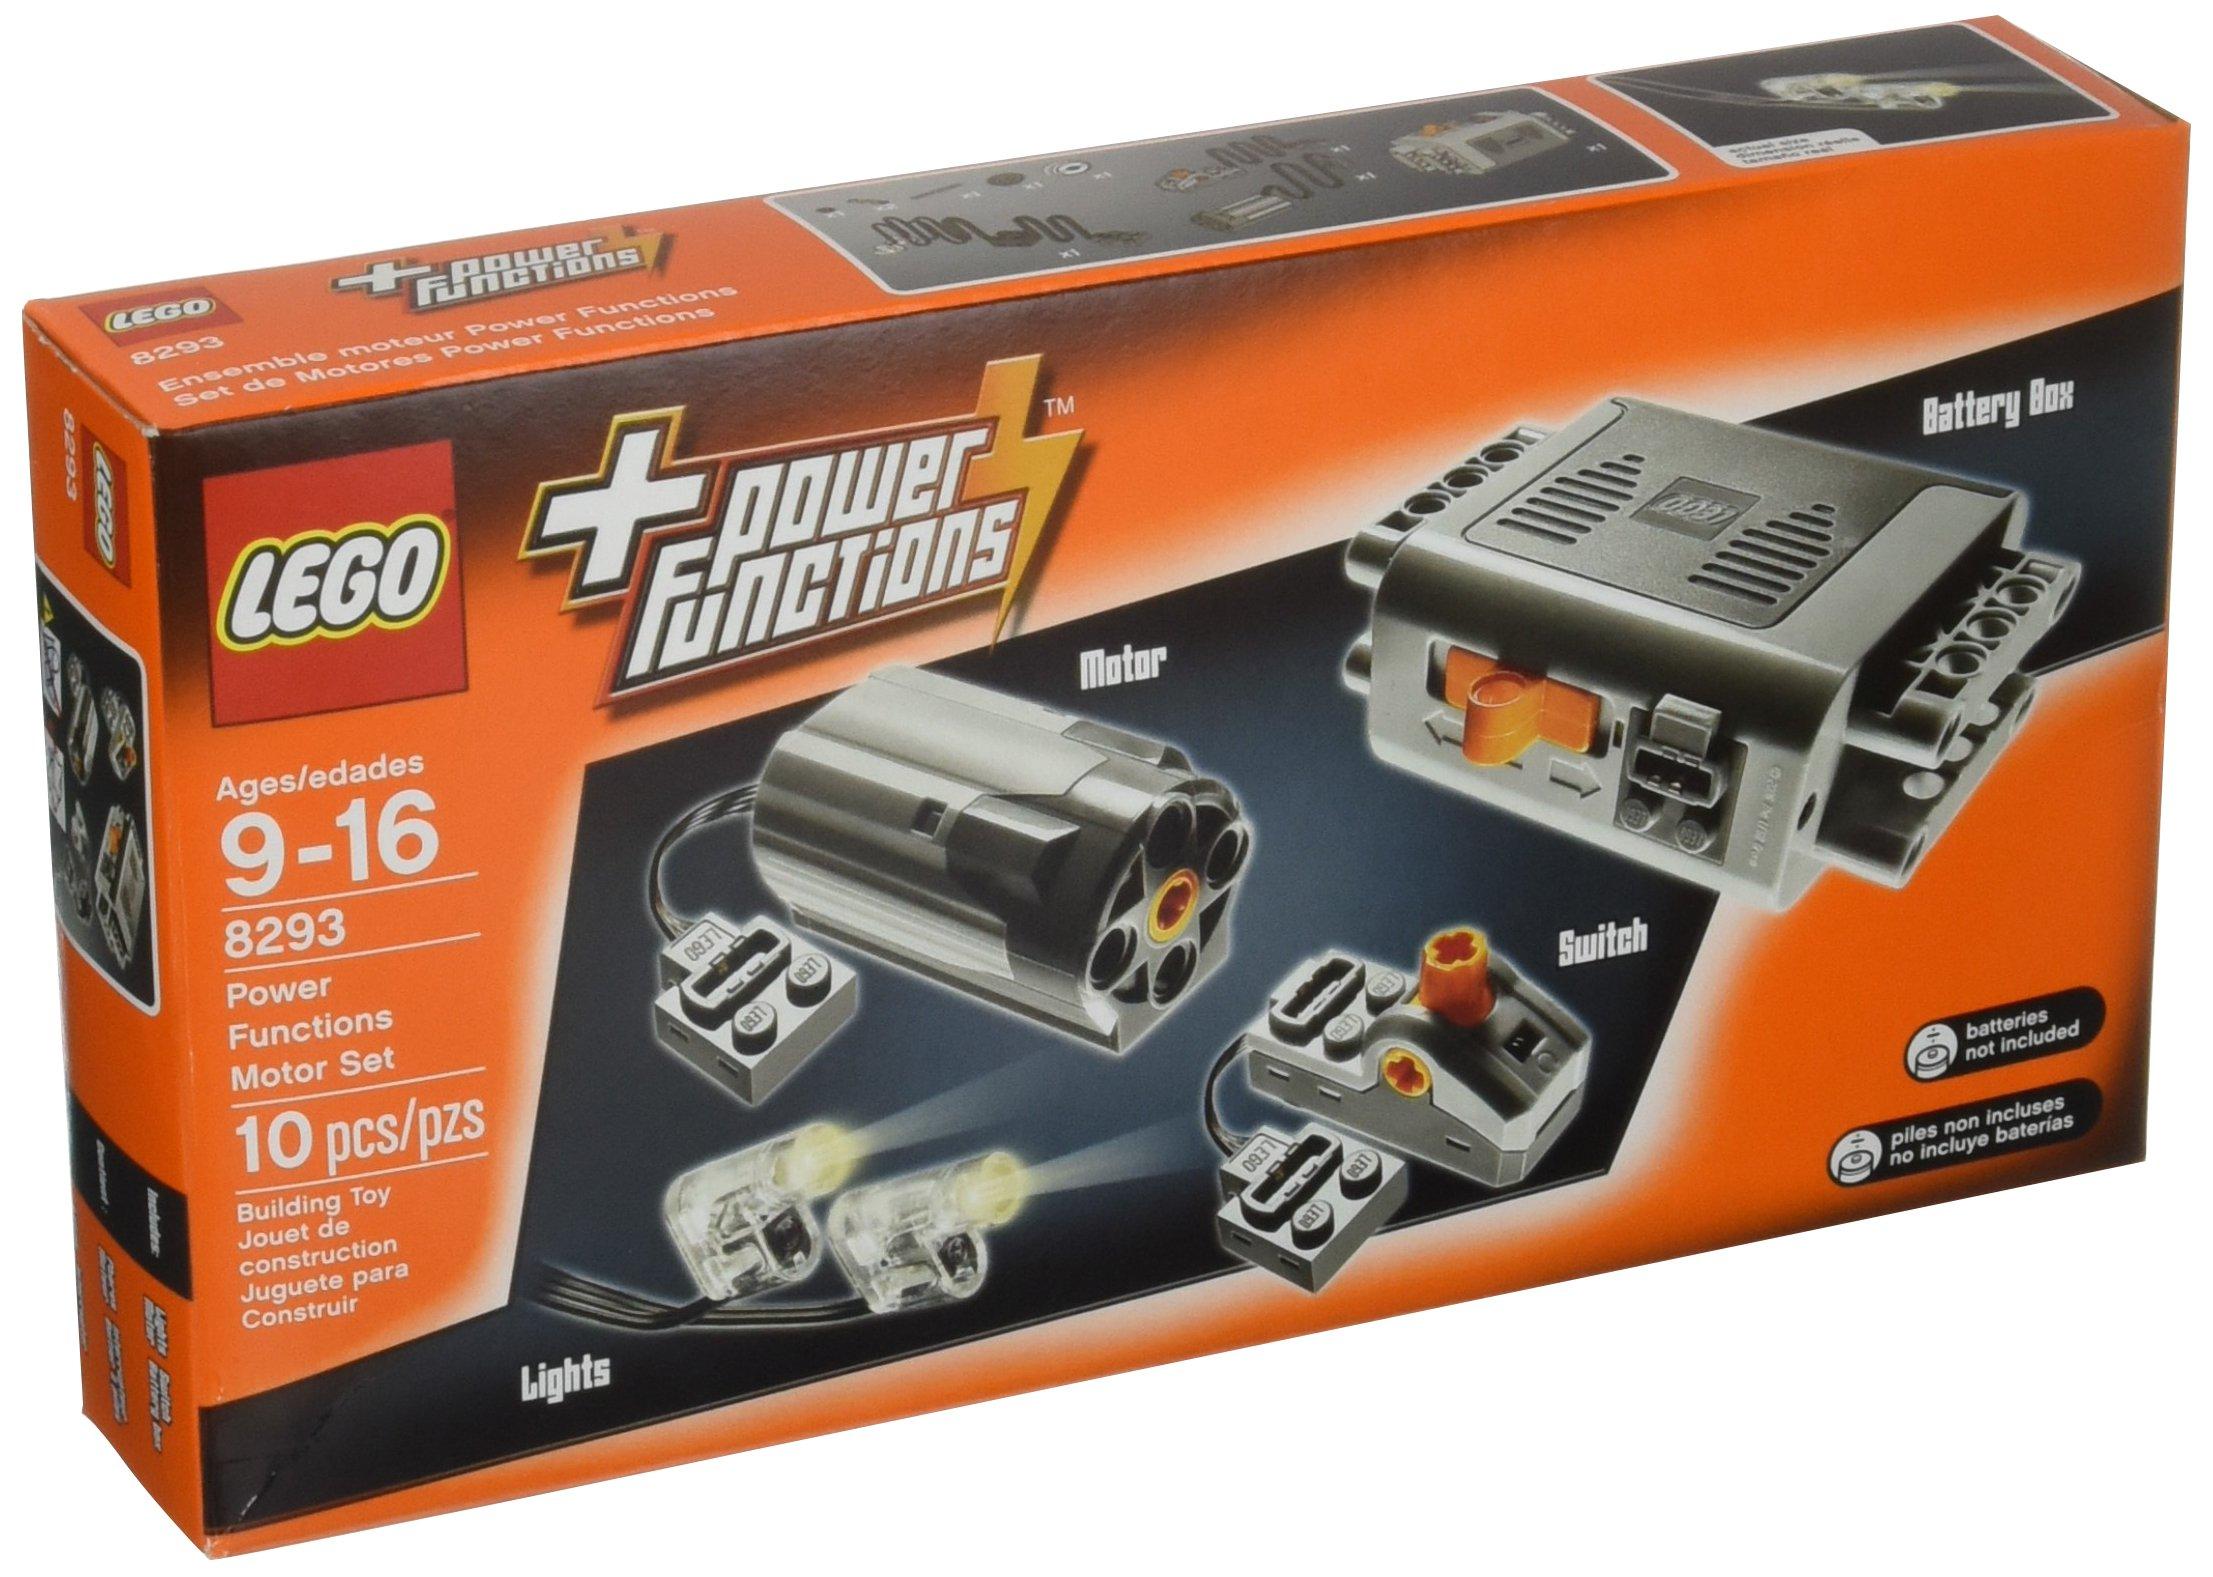 Lego Technic Power Functions Motor